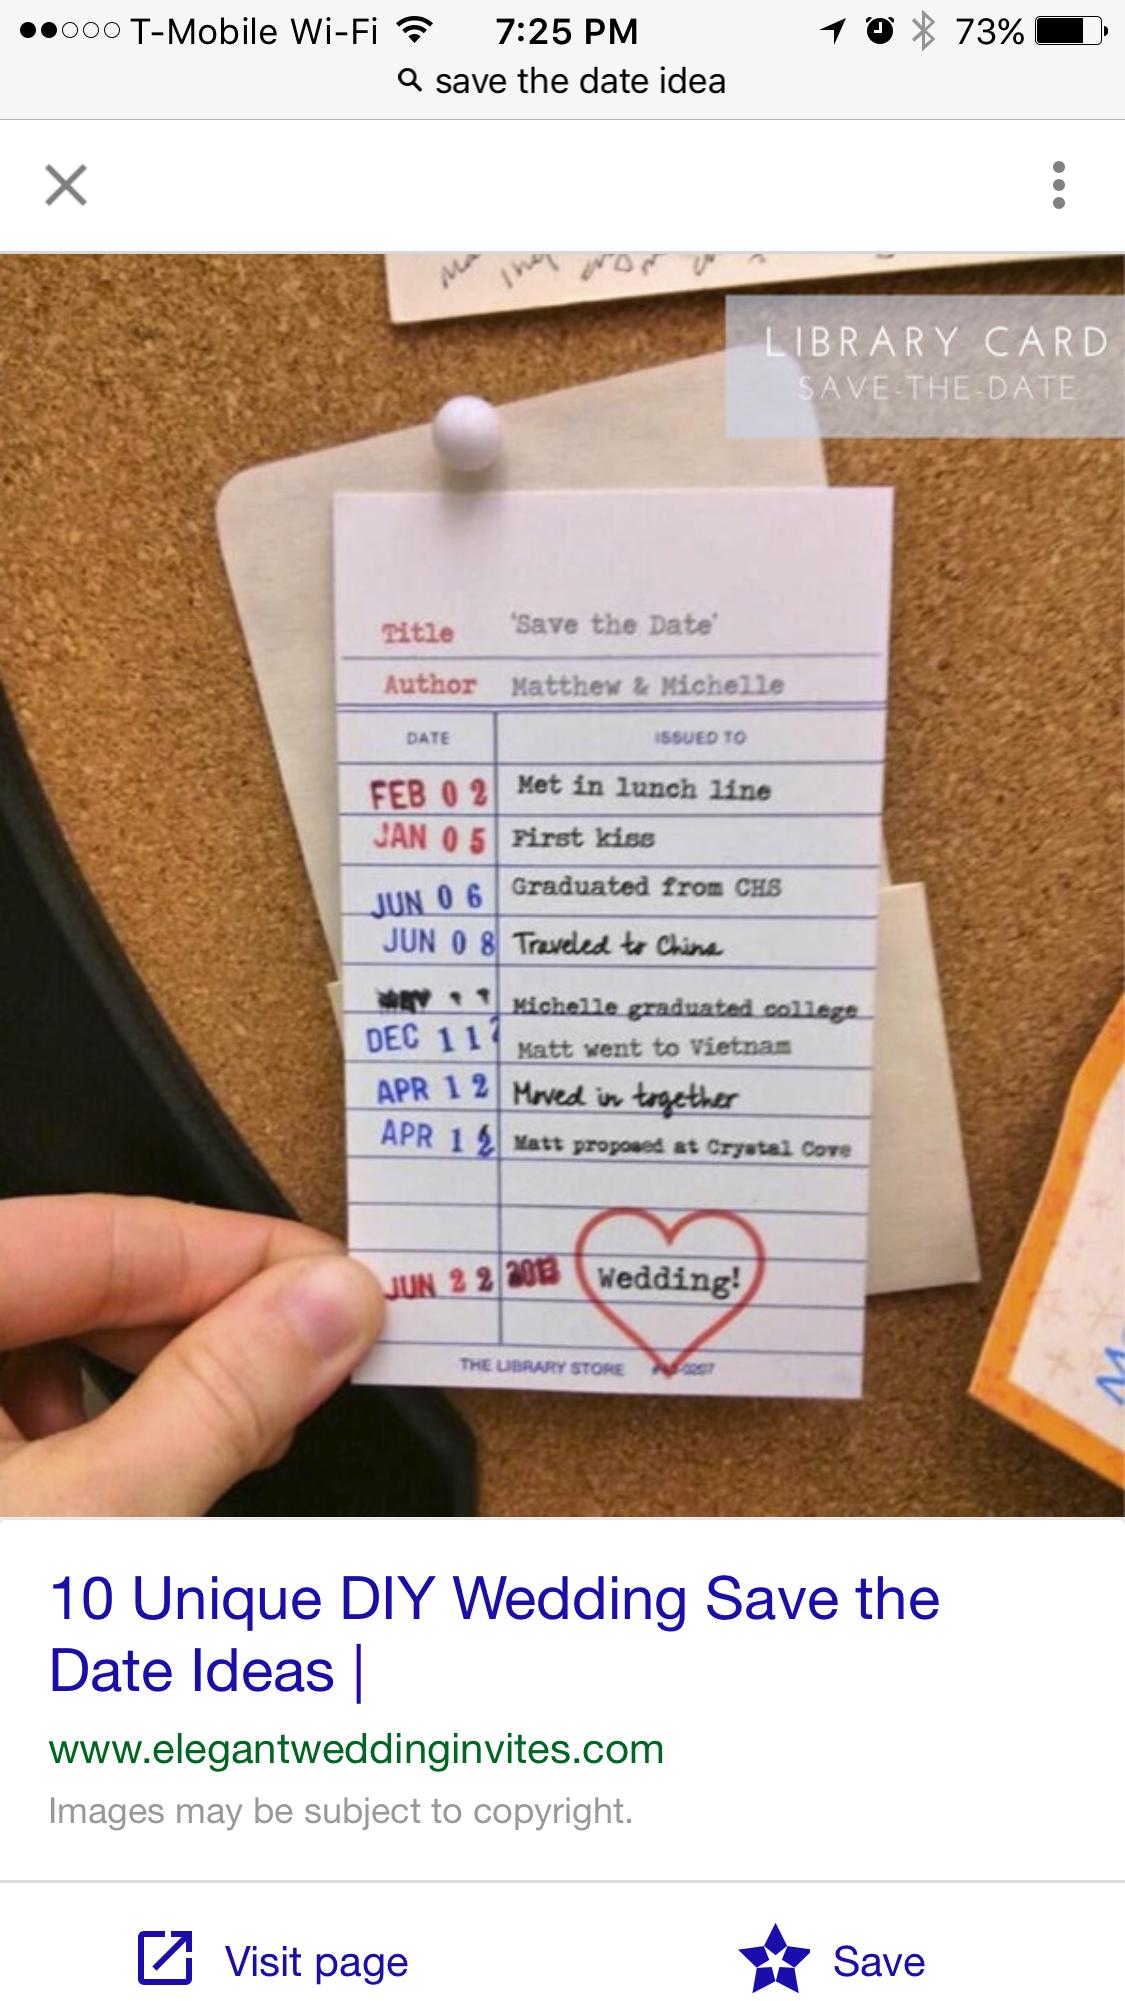 Pin by Karen&Rex Lorenzo on Invitation & Save the Date ...